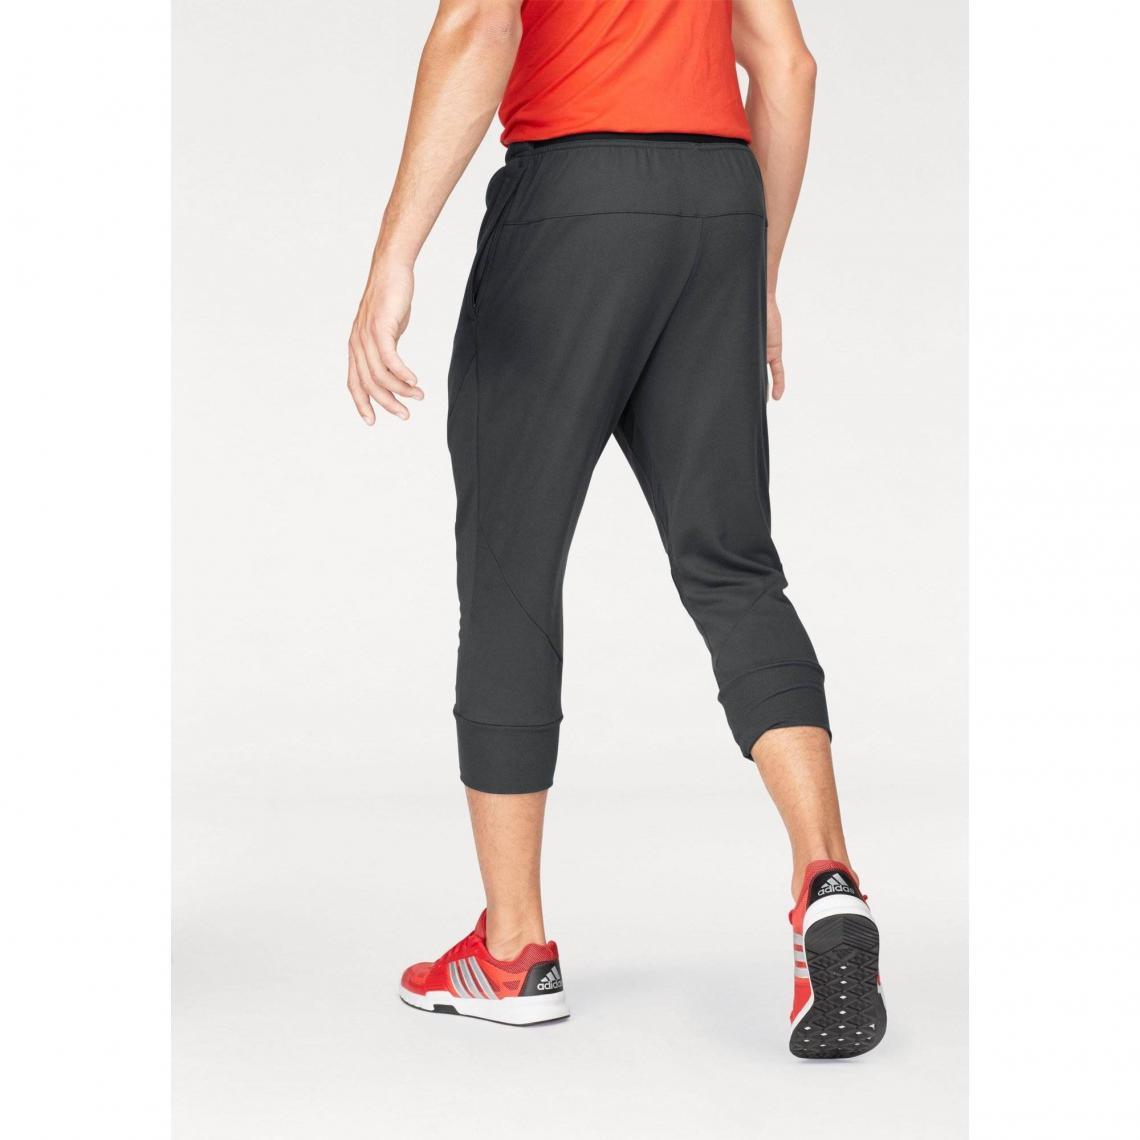 Pantalon Adidas Homme Climacool  92d5564cb08